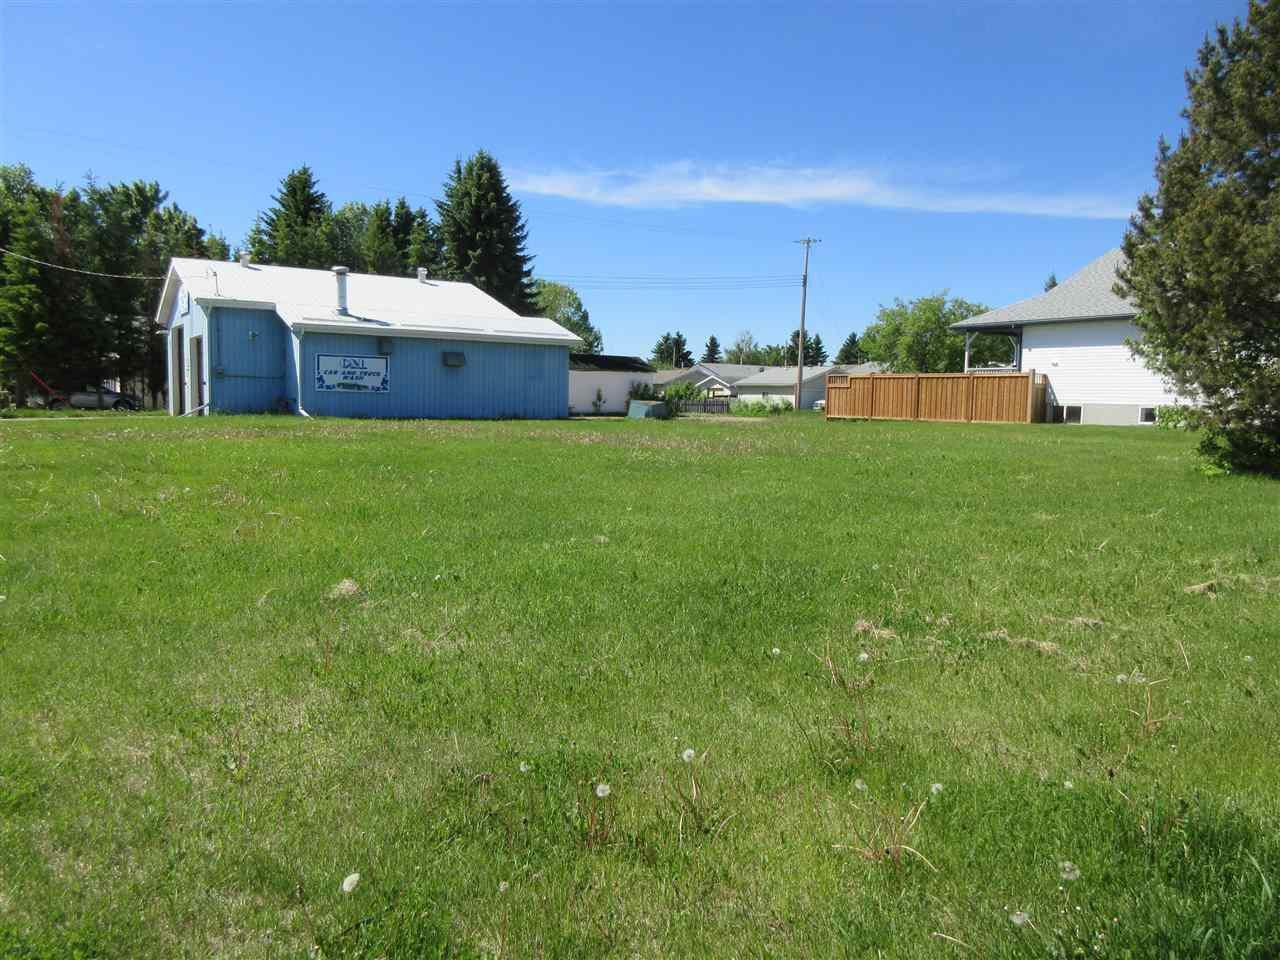 Main Photo: 5003 50 Avenue: Legal Land Commercial for sale : MLS®# E4202013